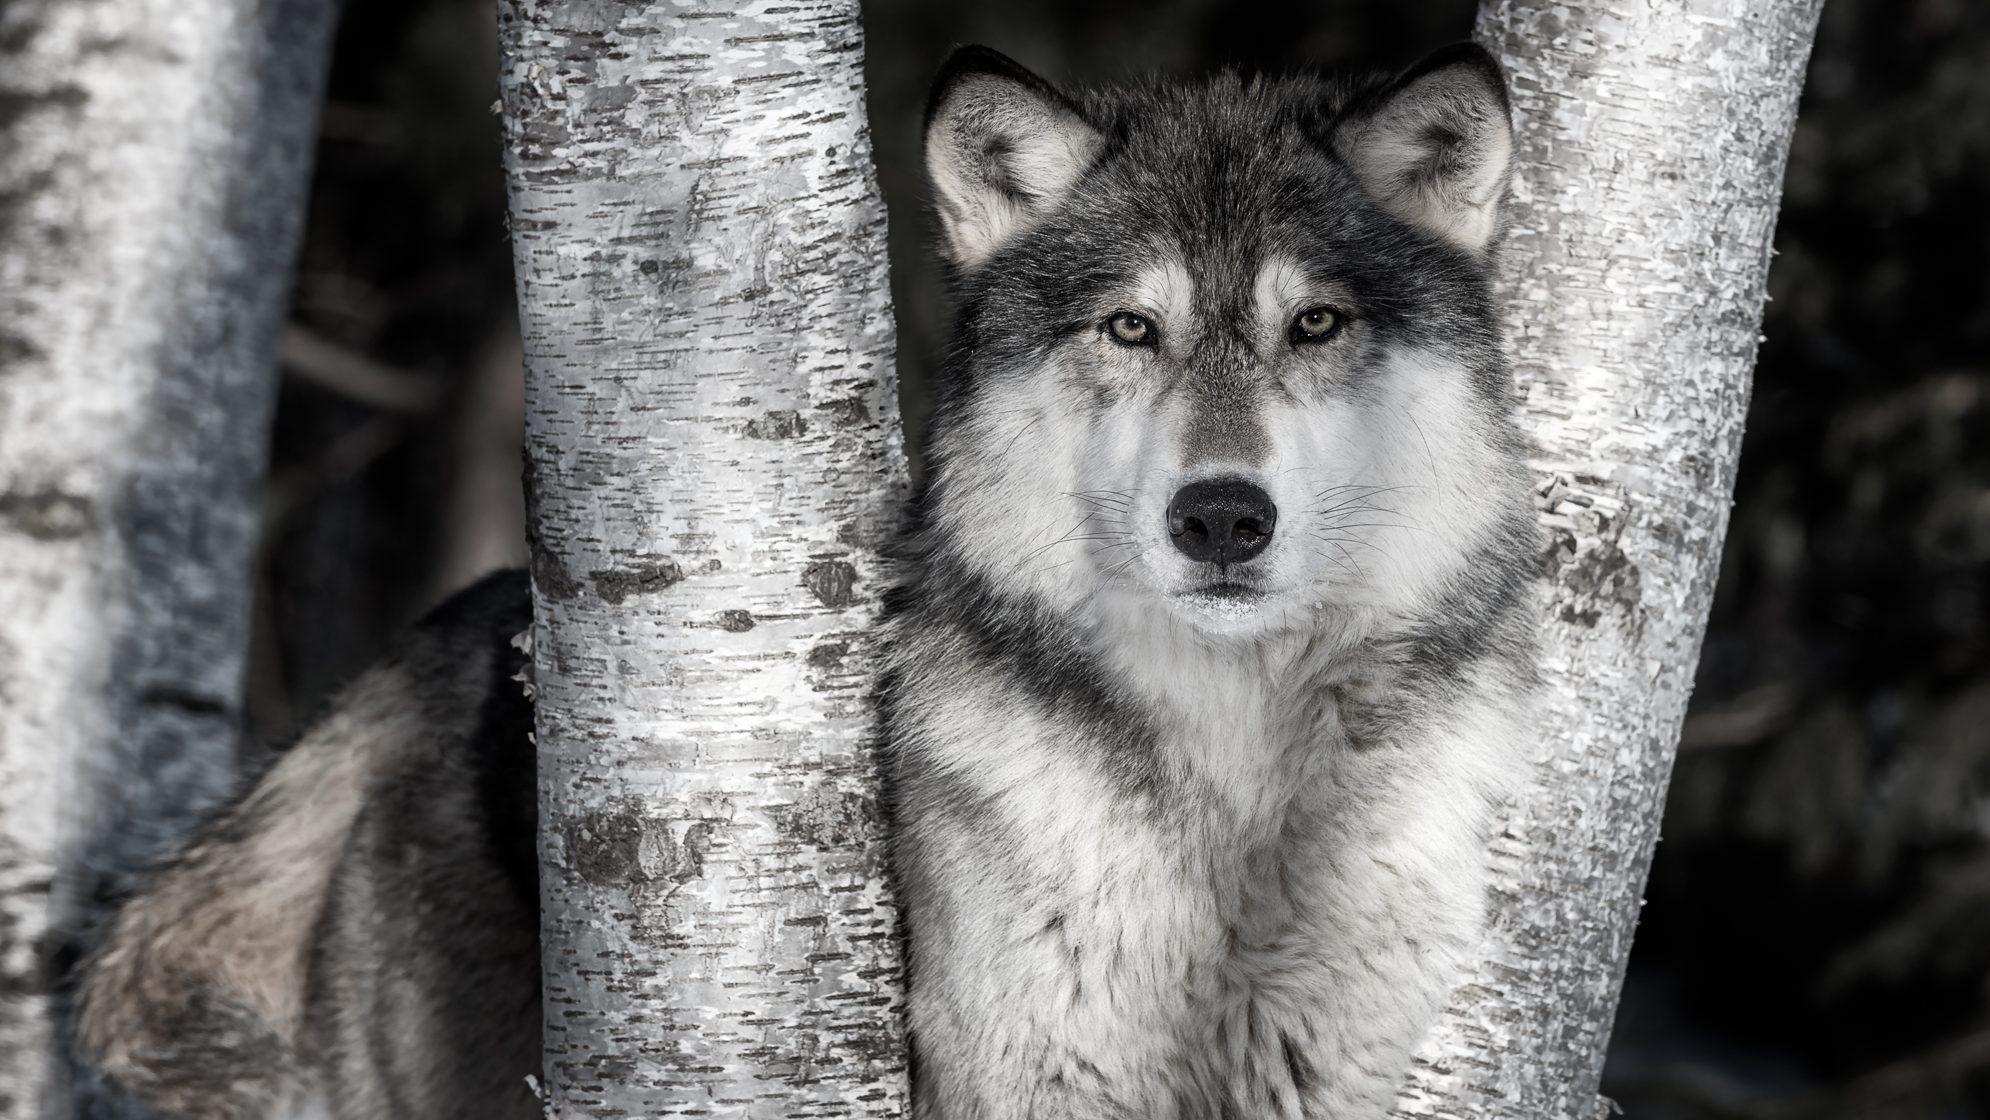 Best wildlife photography spots uk